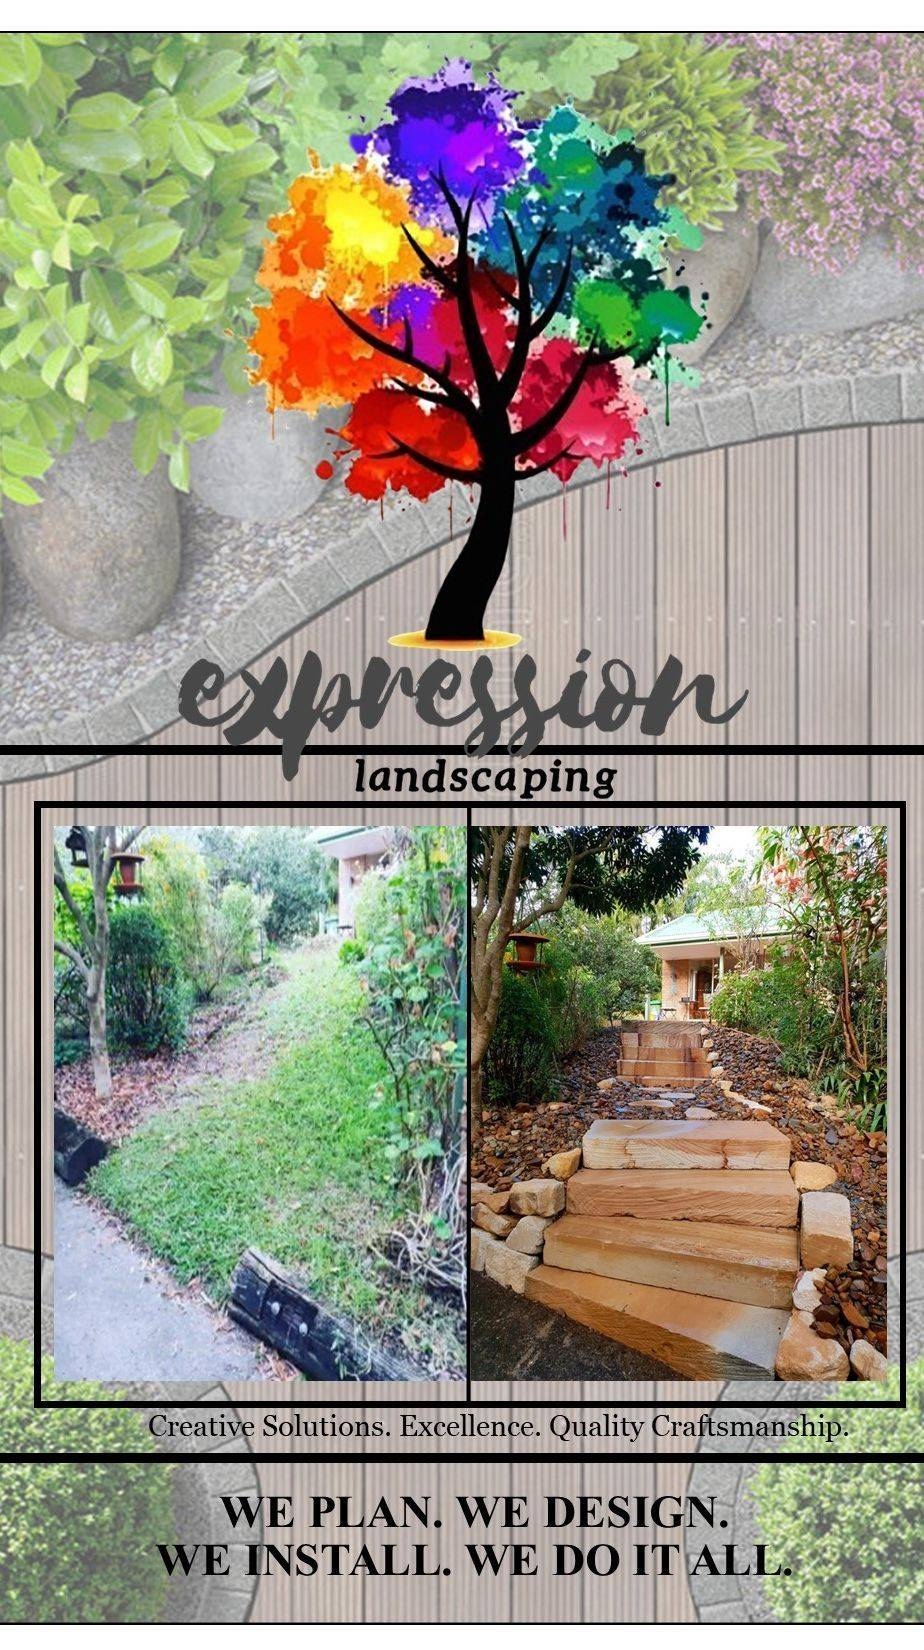 Landscaping design book, landscaping design ideas